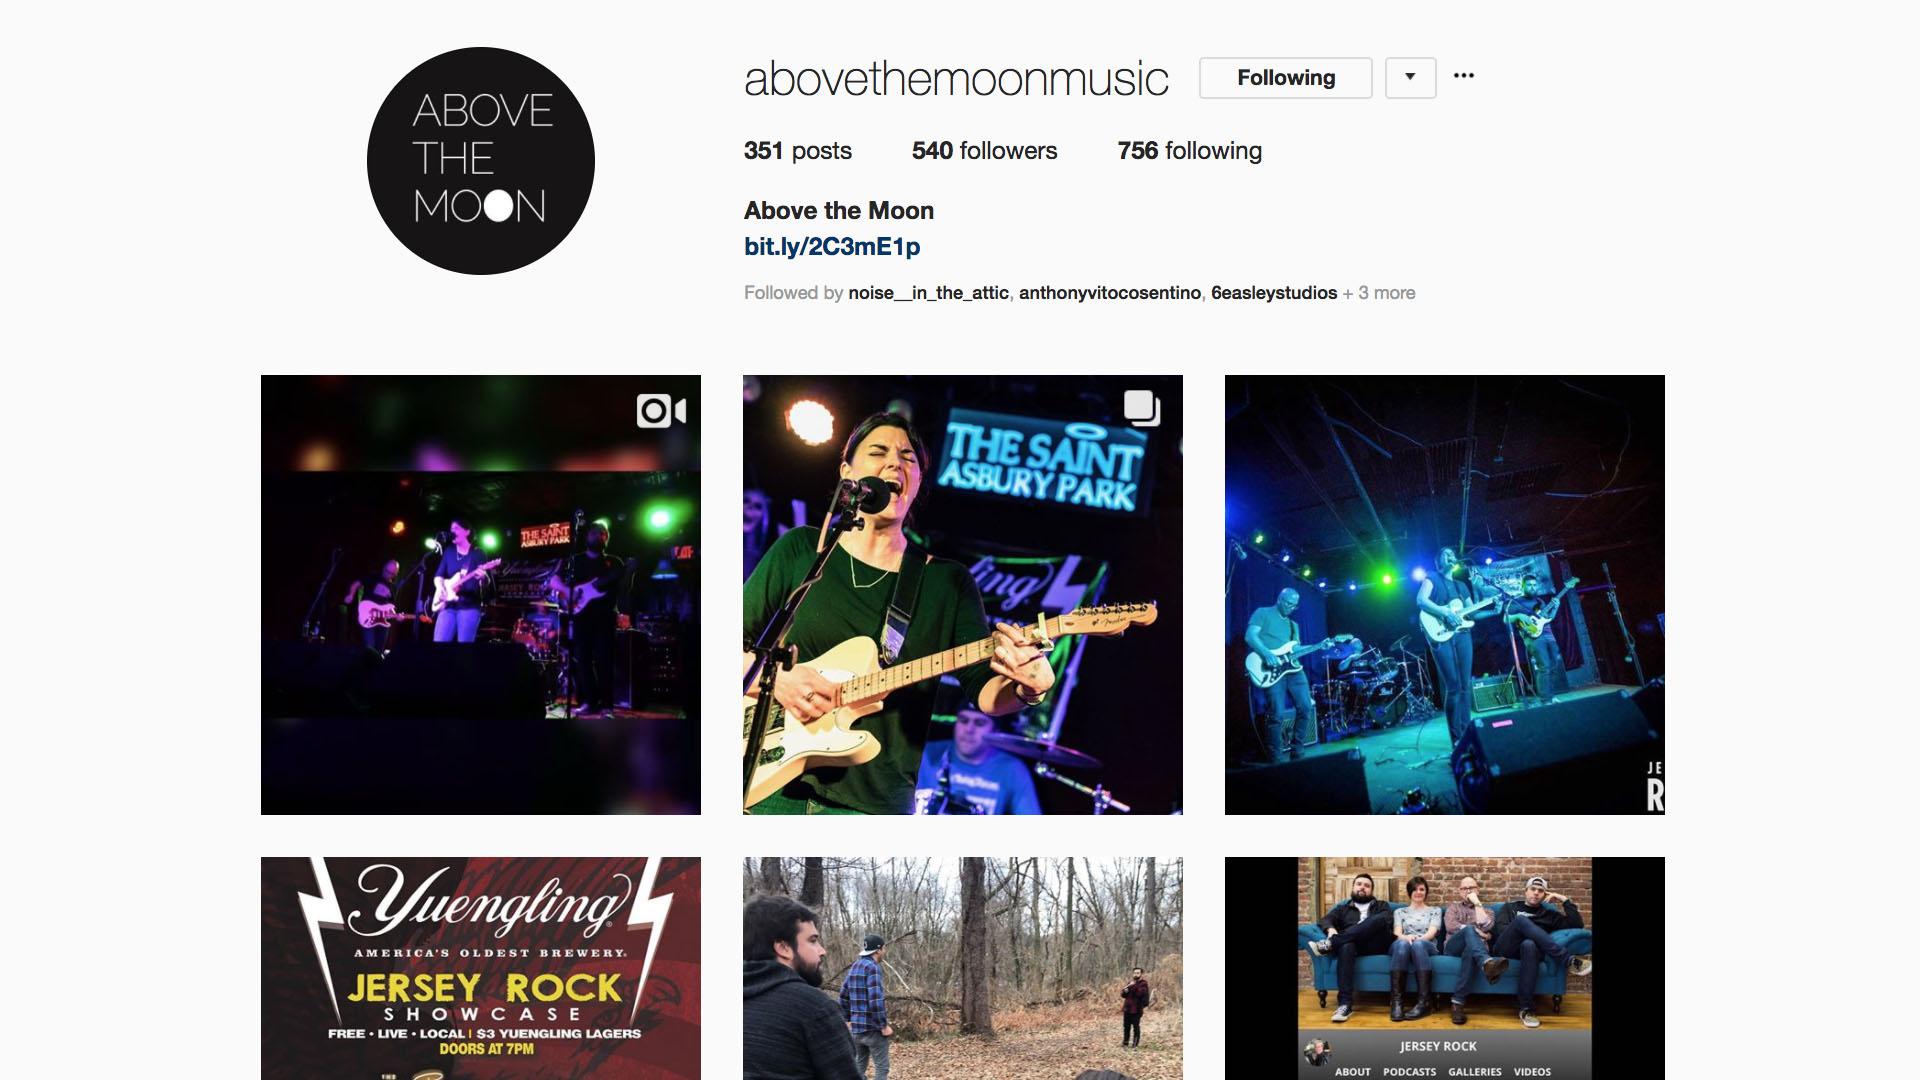 instagram.com/abovethemoonmusic